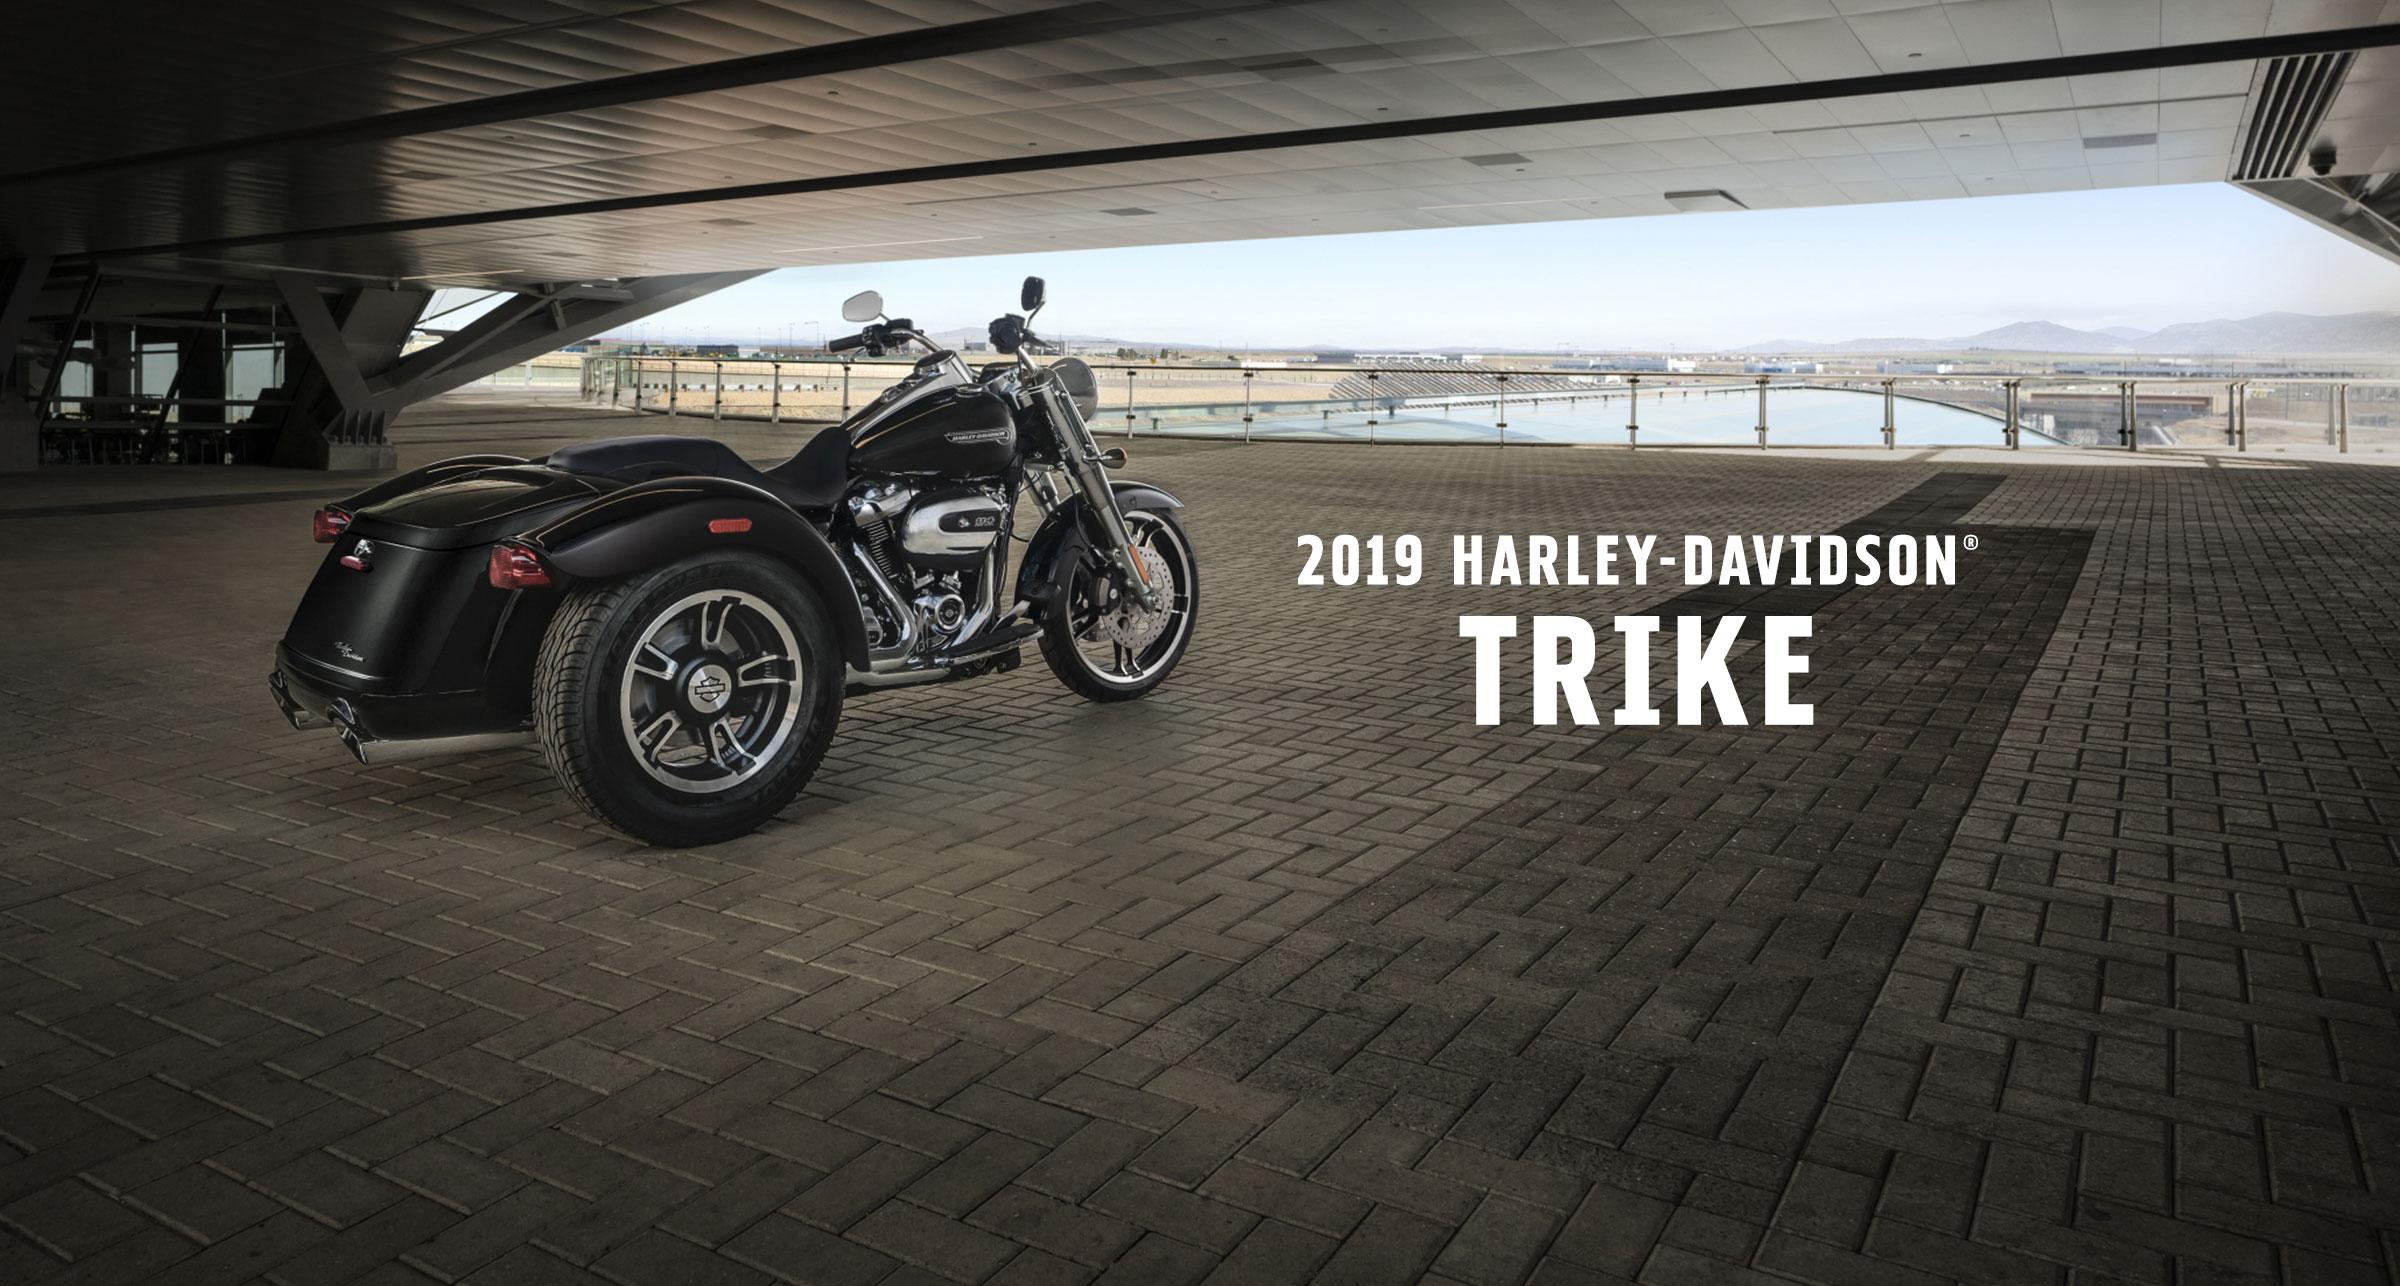 Trike - 2019年モデル